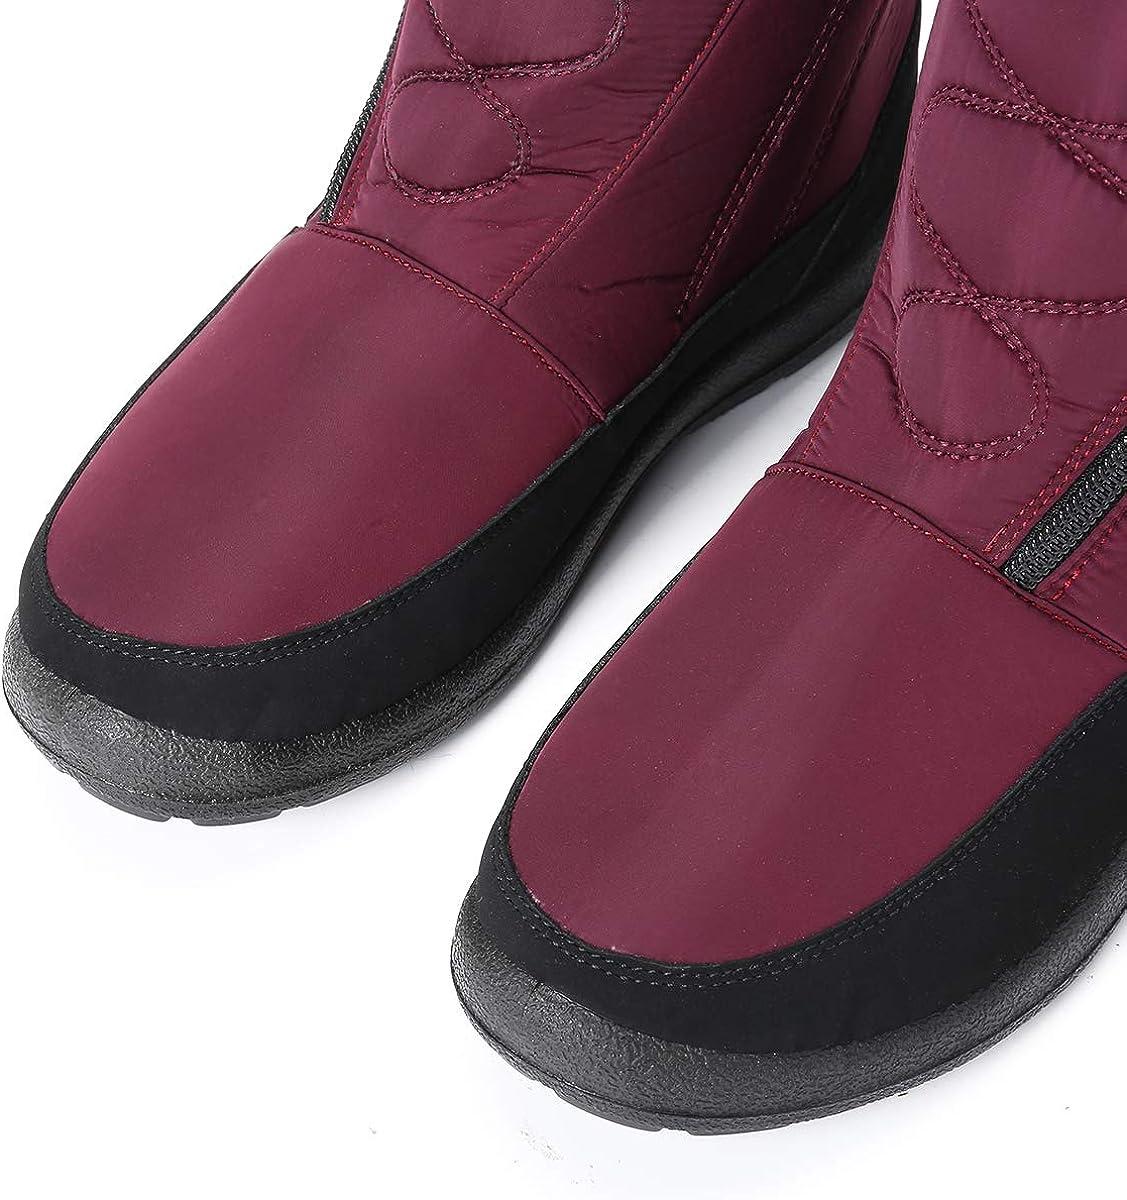 Camfosy Botas de Nieve para Mujer Zapatos de Invierno Botas de Lluvia de Piel Botas Impermeables Furty Rising Hot para Caminar Senderismo